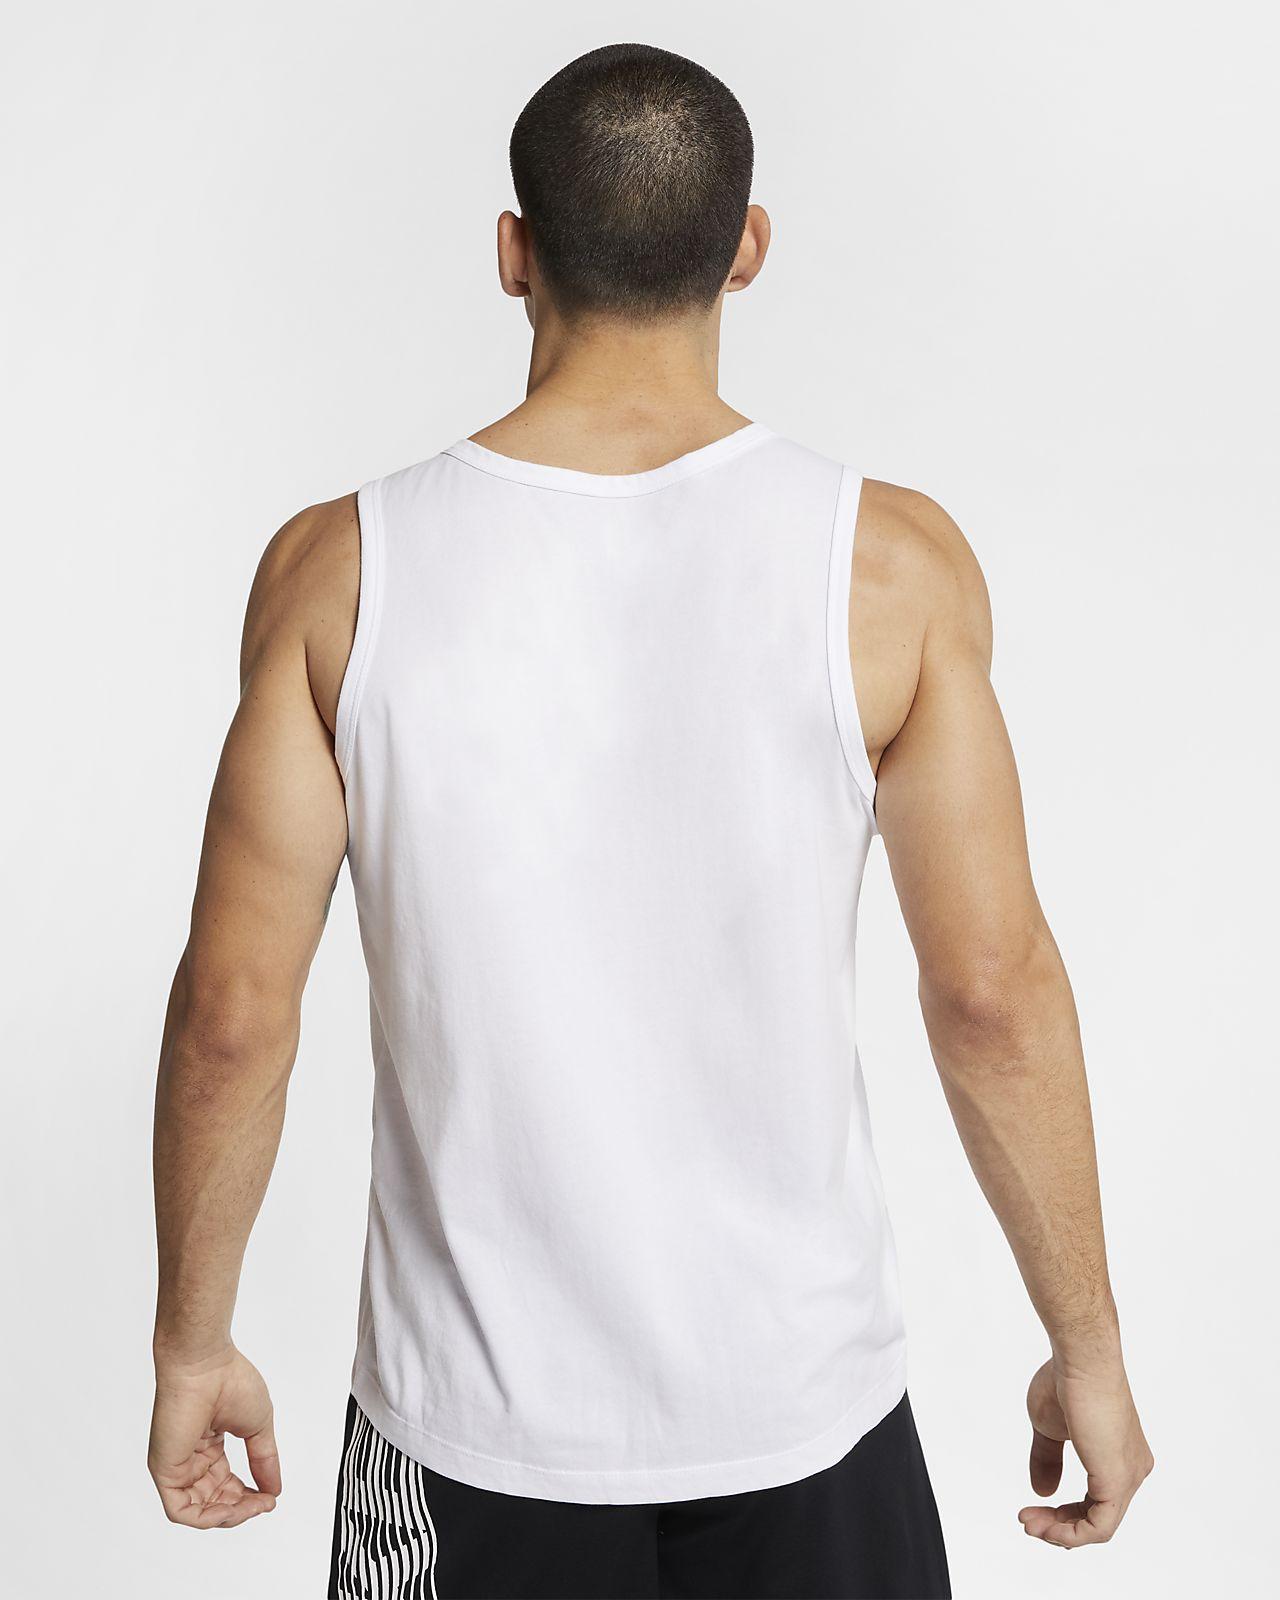 369cd1373f4 Camiseta de tirantes de entrenamiento para hombre Nike Dri-FIT. Nike ...